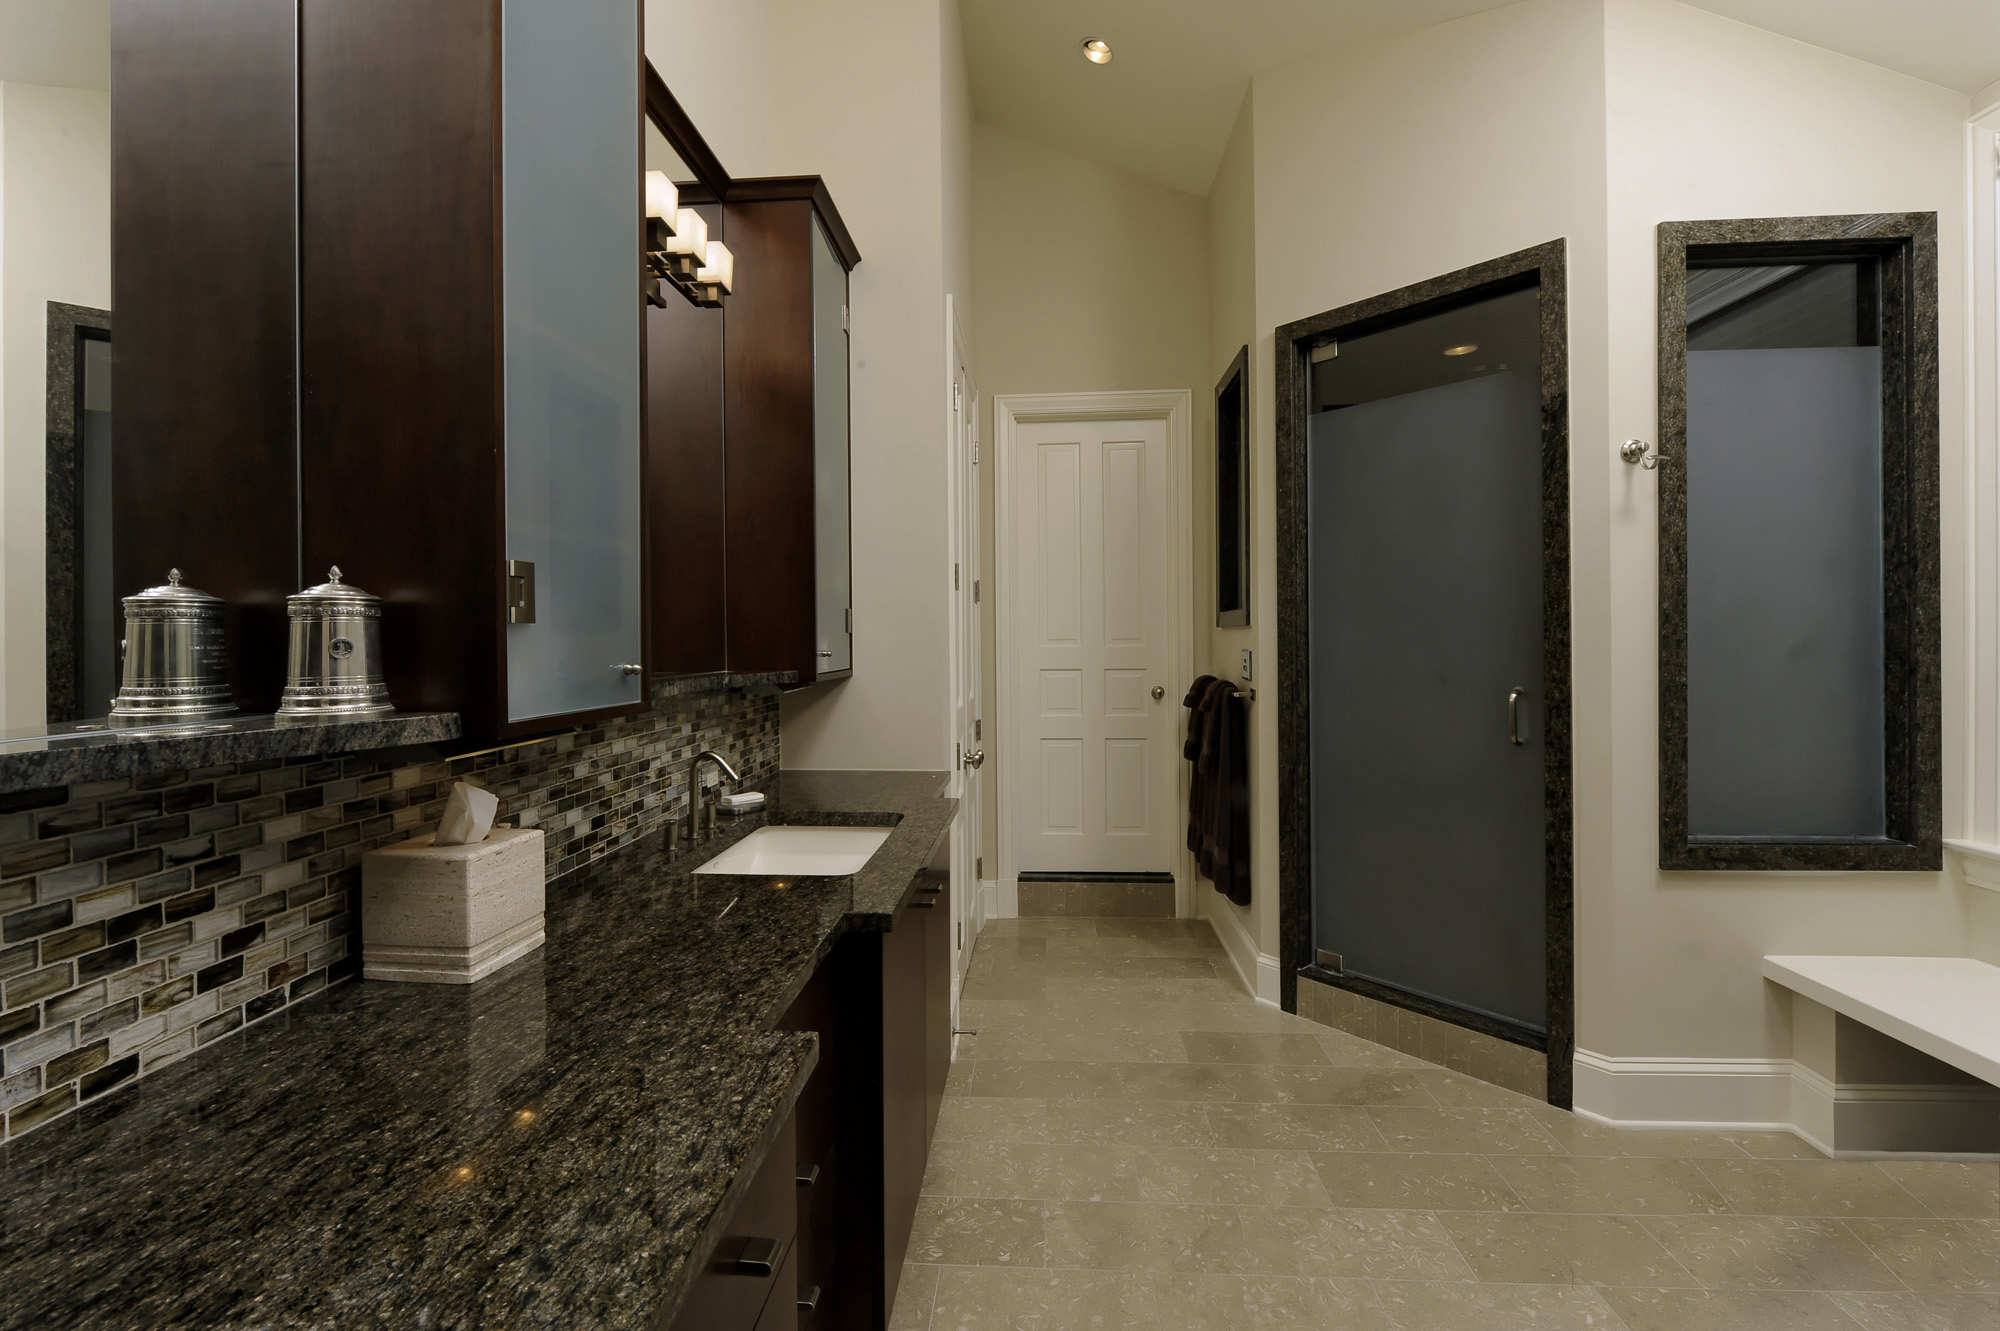 Master Bathroom Remodel Potomac Md. Bathroom Remodeling Potomac Md   Clairelevy